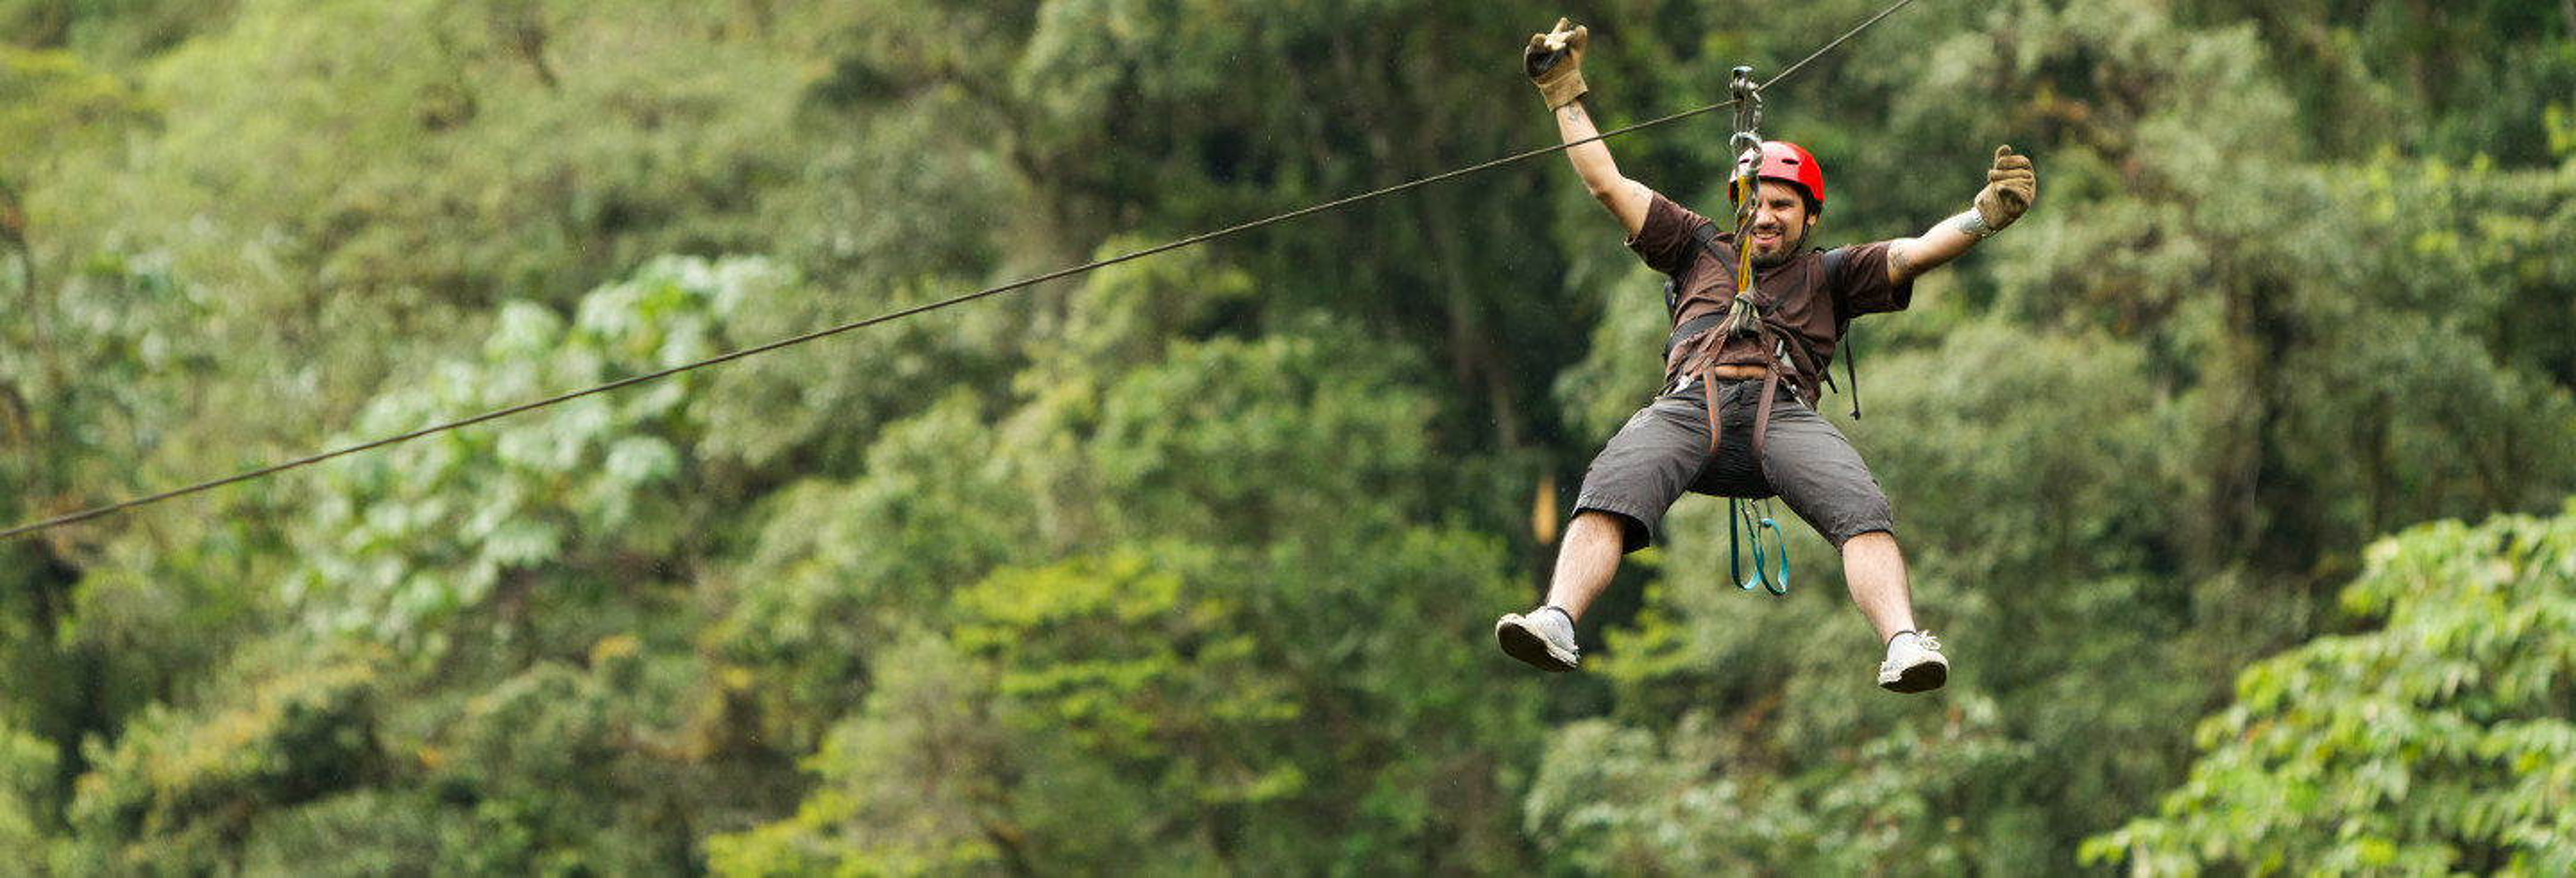 Jungle Zipline Adventure in Puerto Vallarta